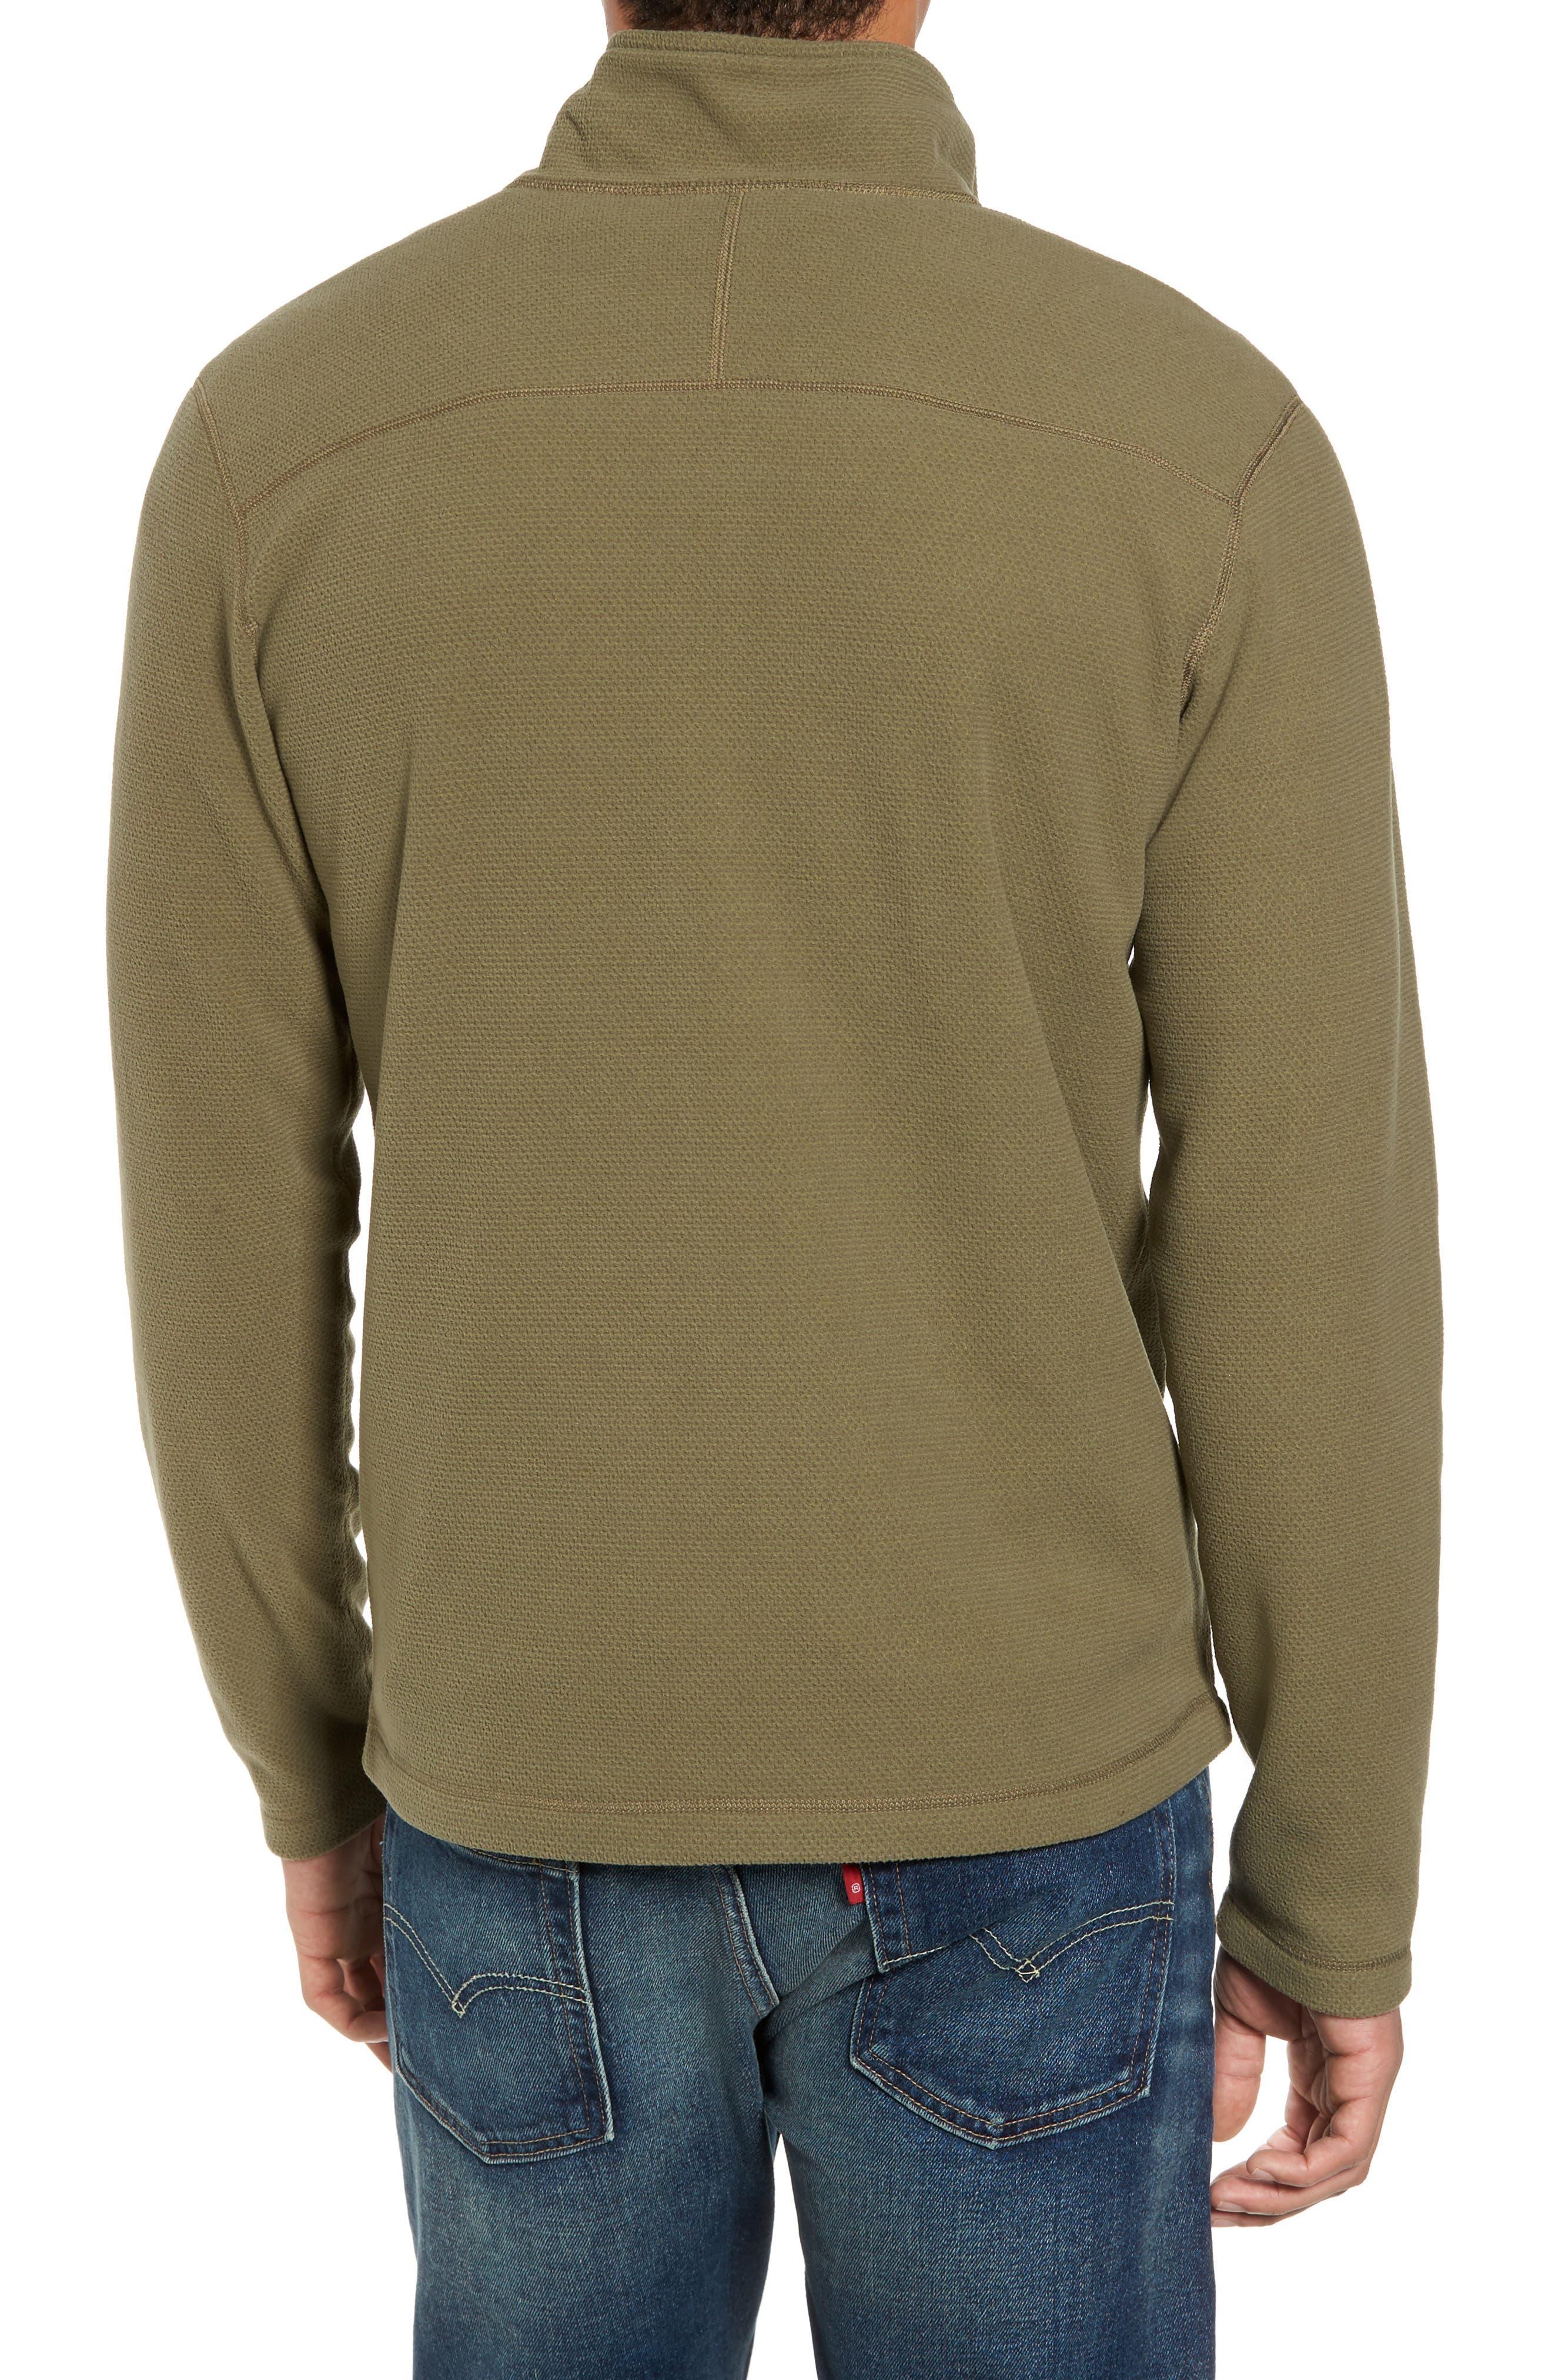 Alternate Image 2  - The North Face Cap Rock Fleece Jacket